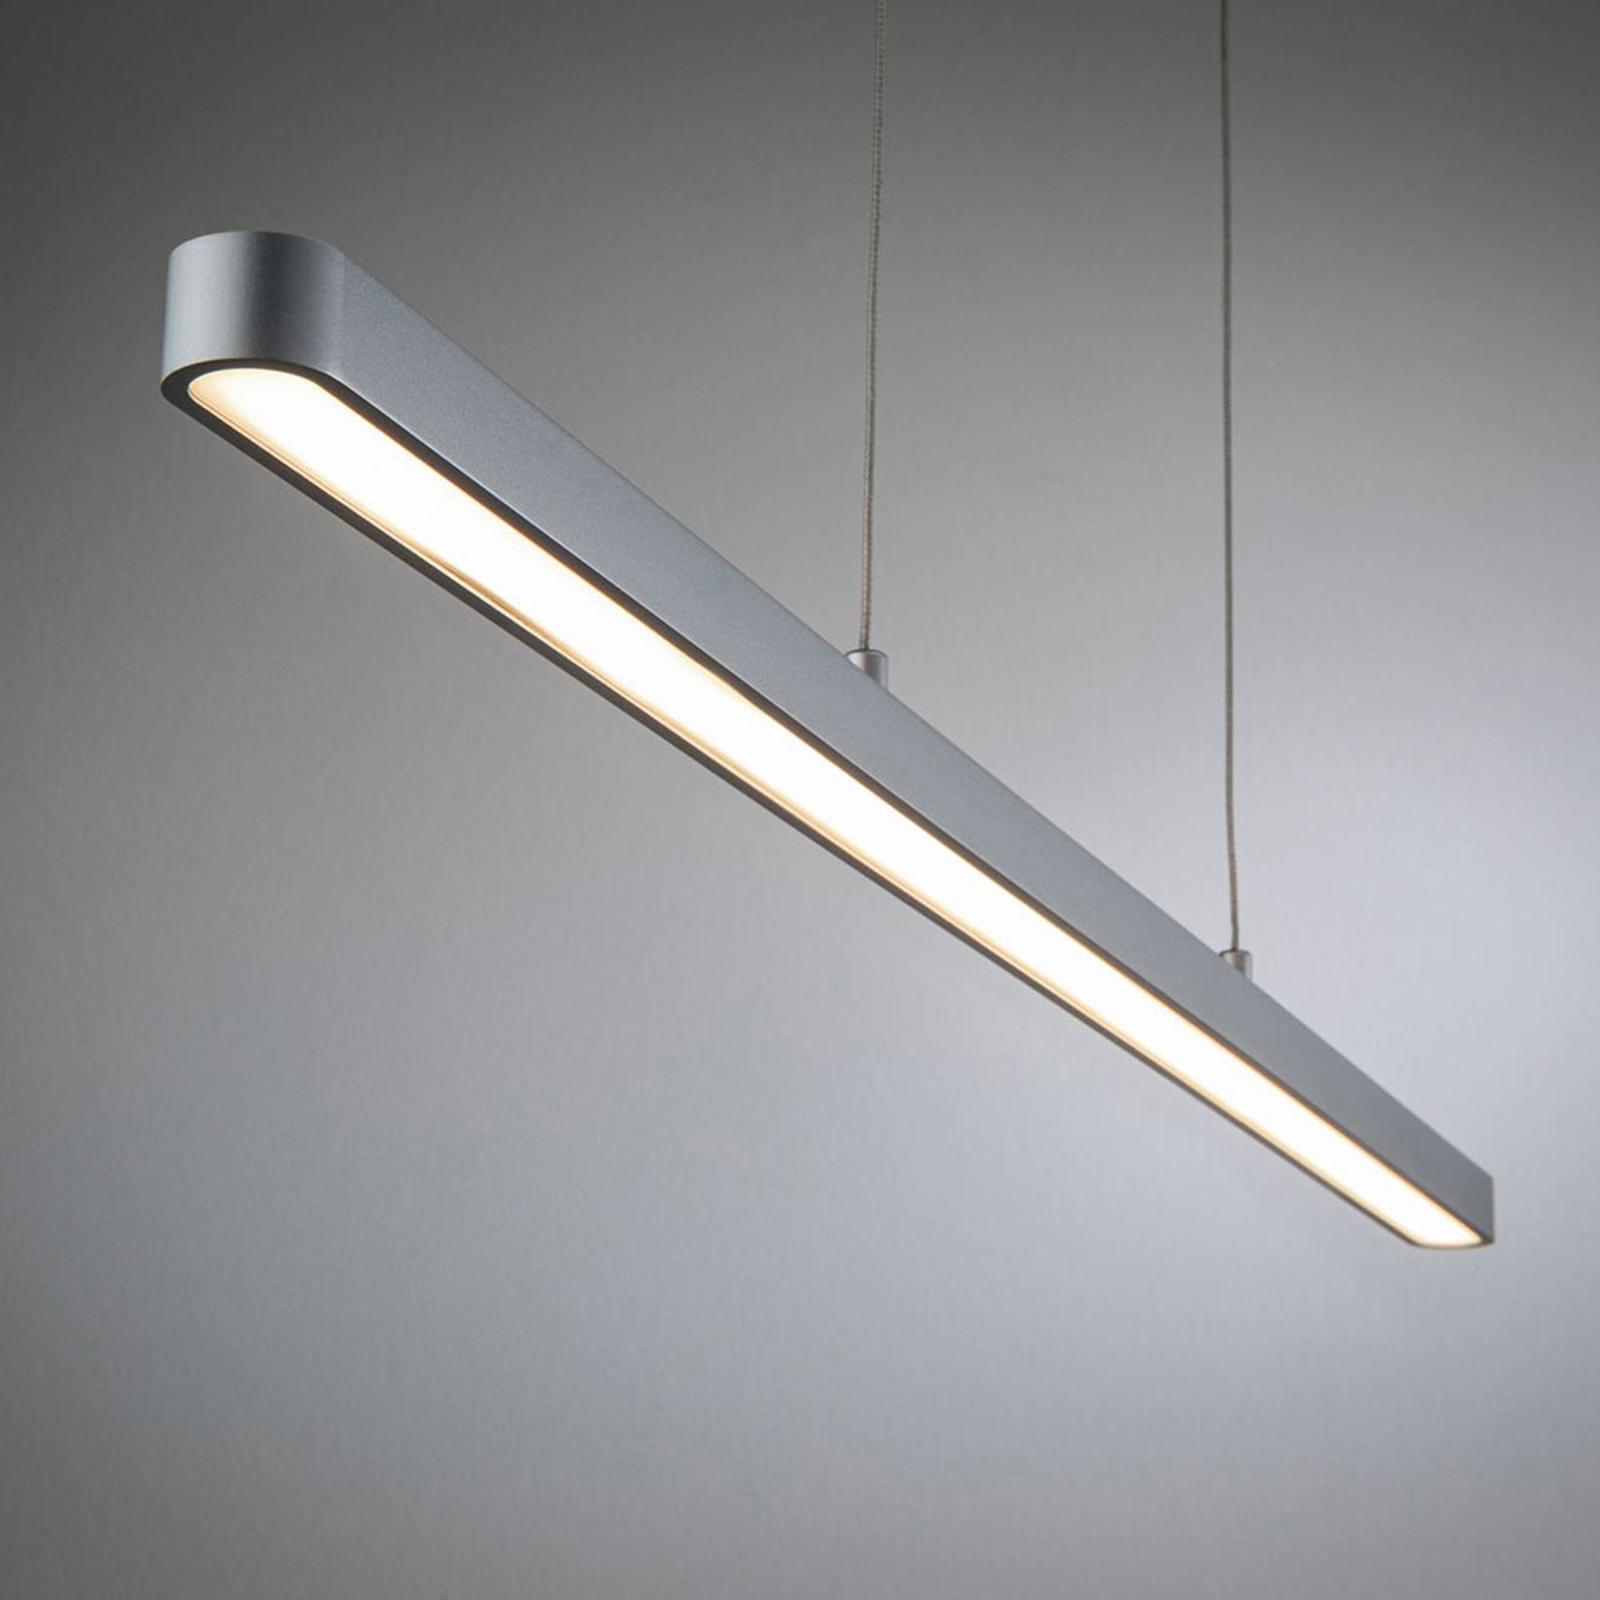 Paulmann URail suspension LED Lento chromée mate